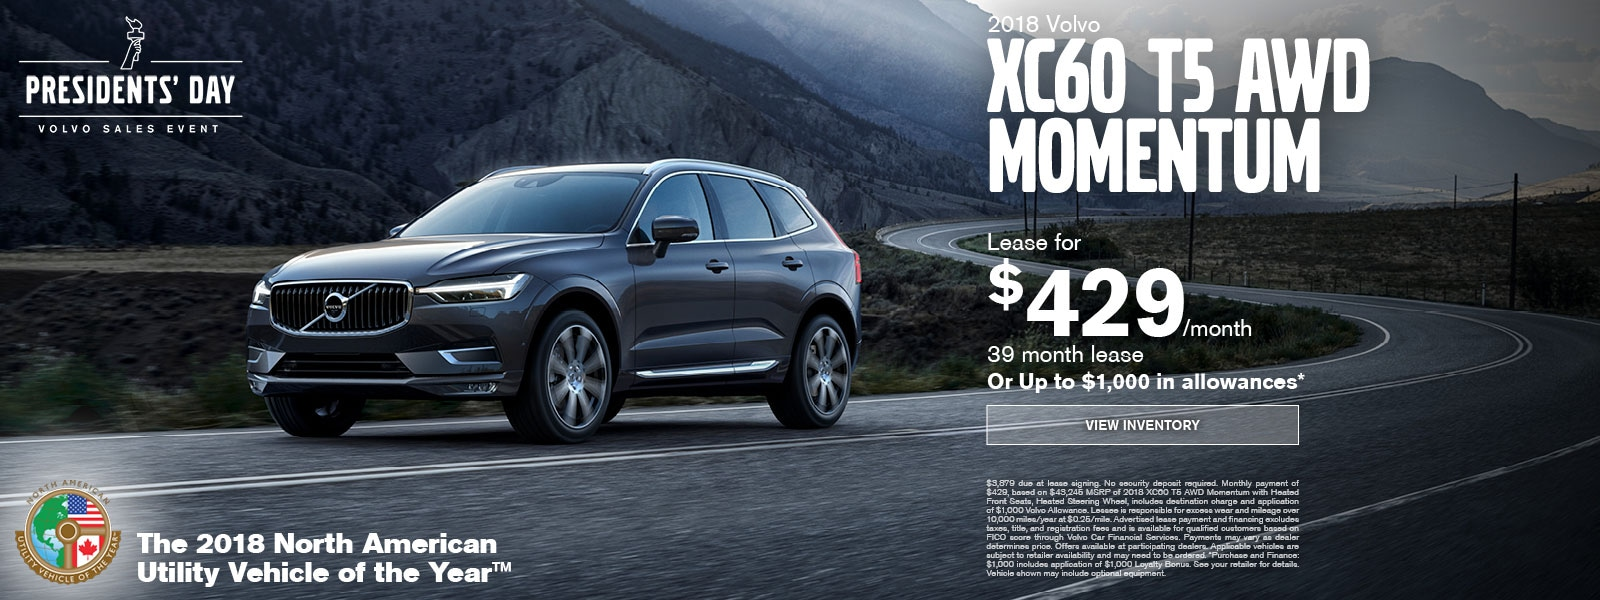 Volvo El Paso, TX | New & Used Car Dealer Socorro